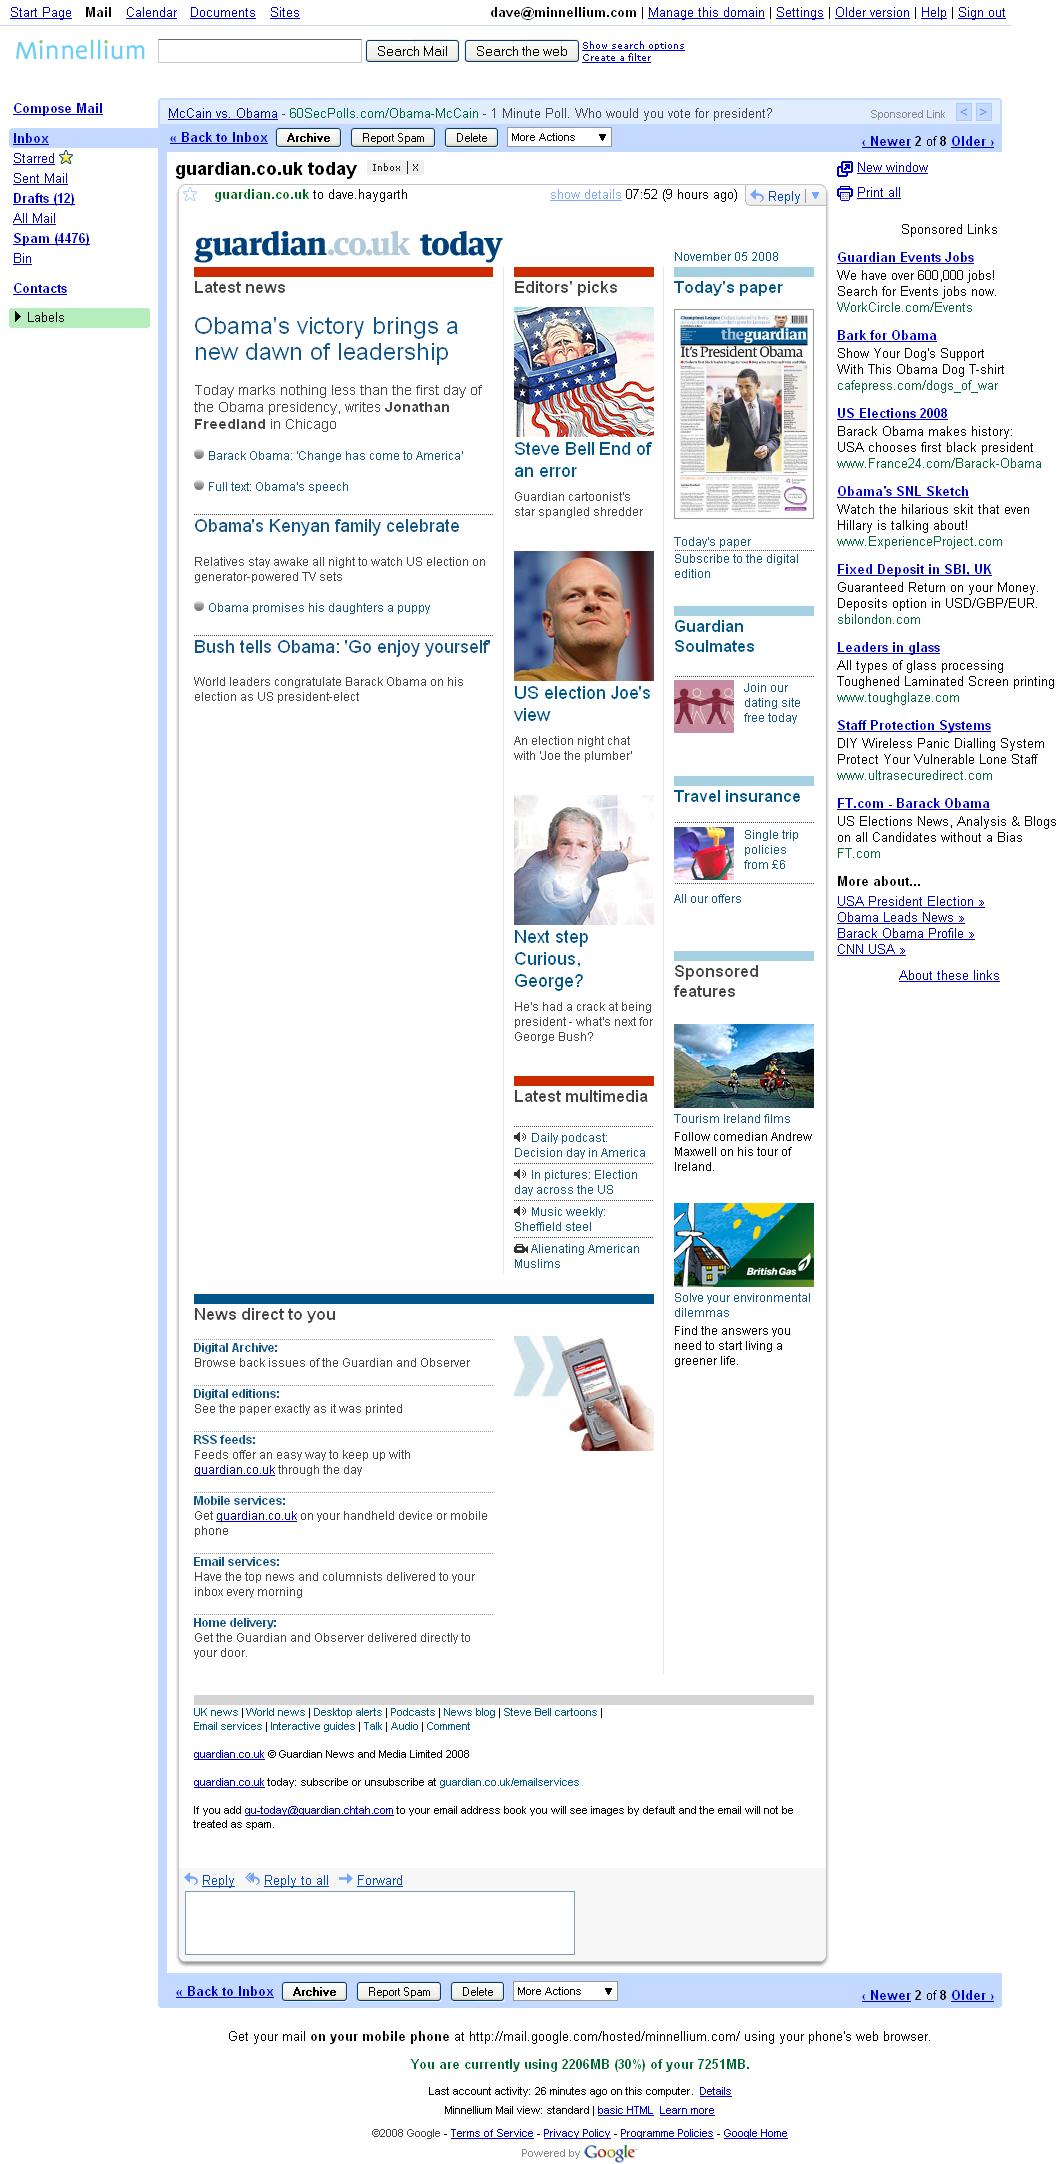 2008-11-05